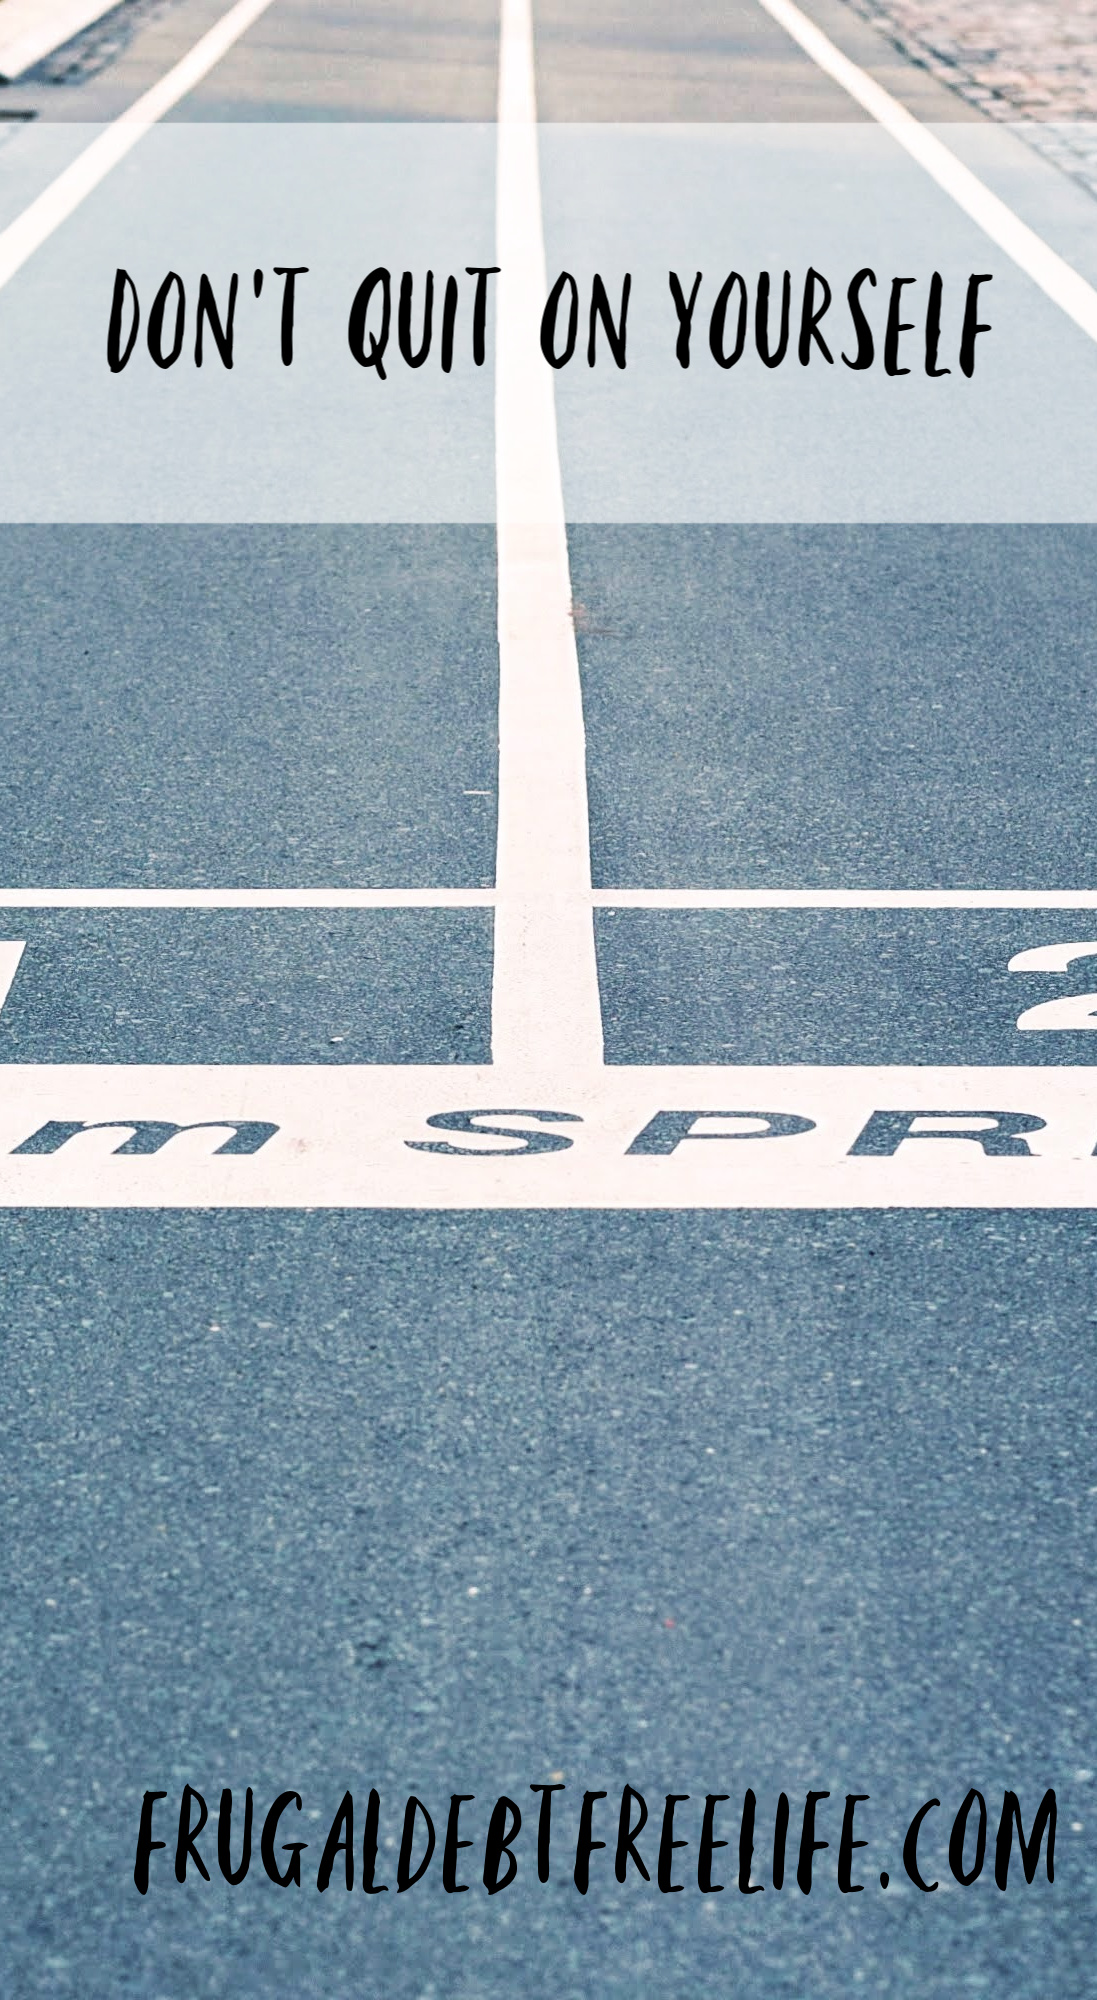 field-events-finish-line-goal-60230 (1).jpg